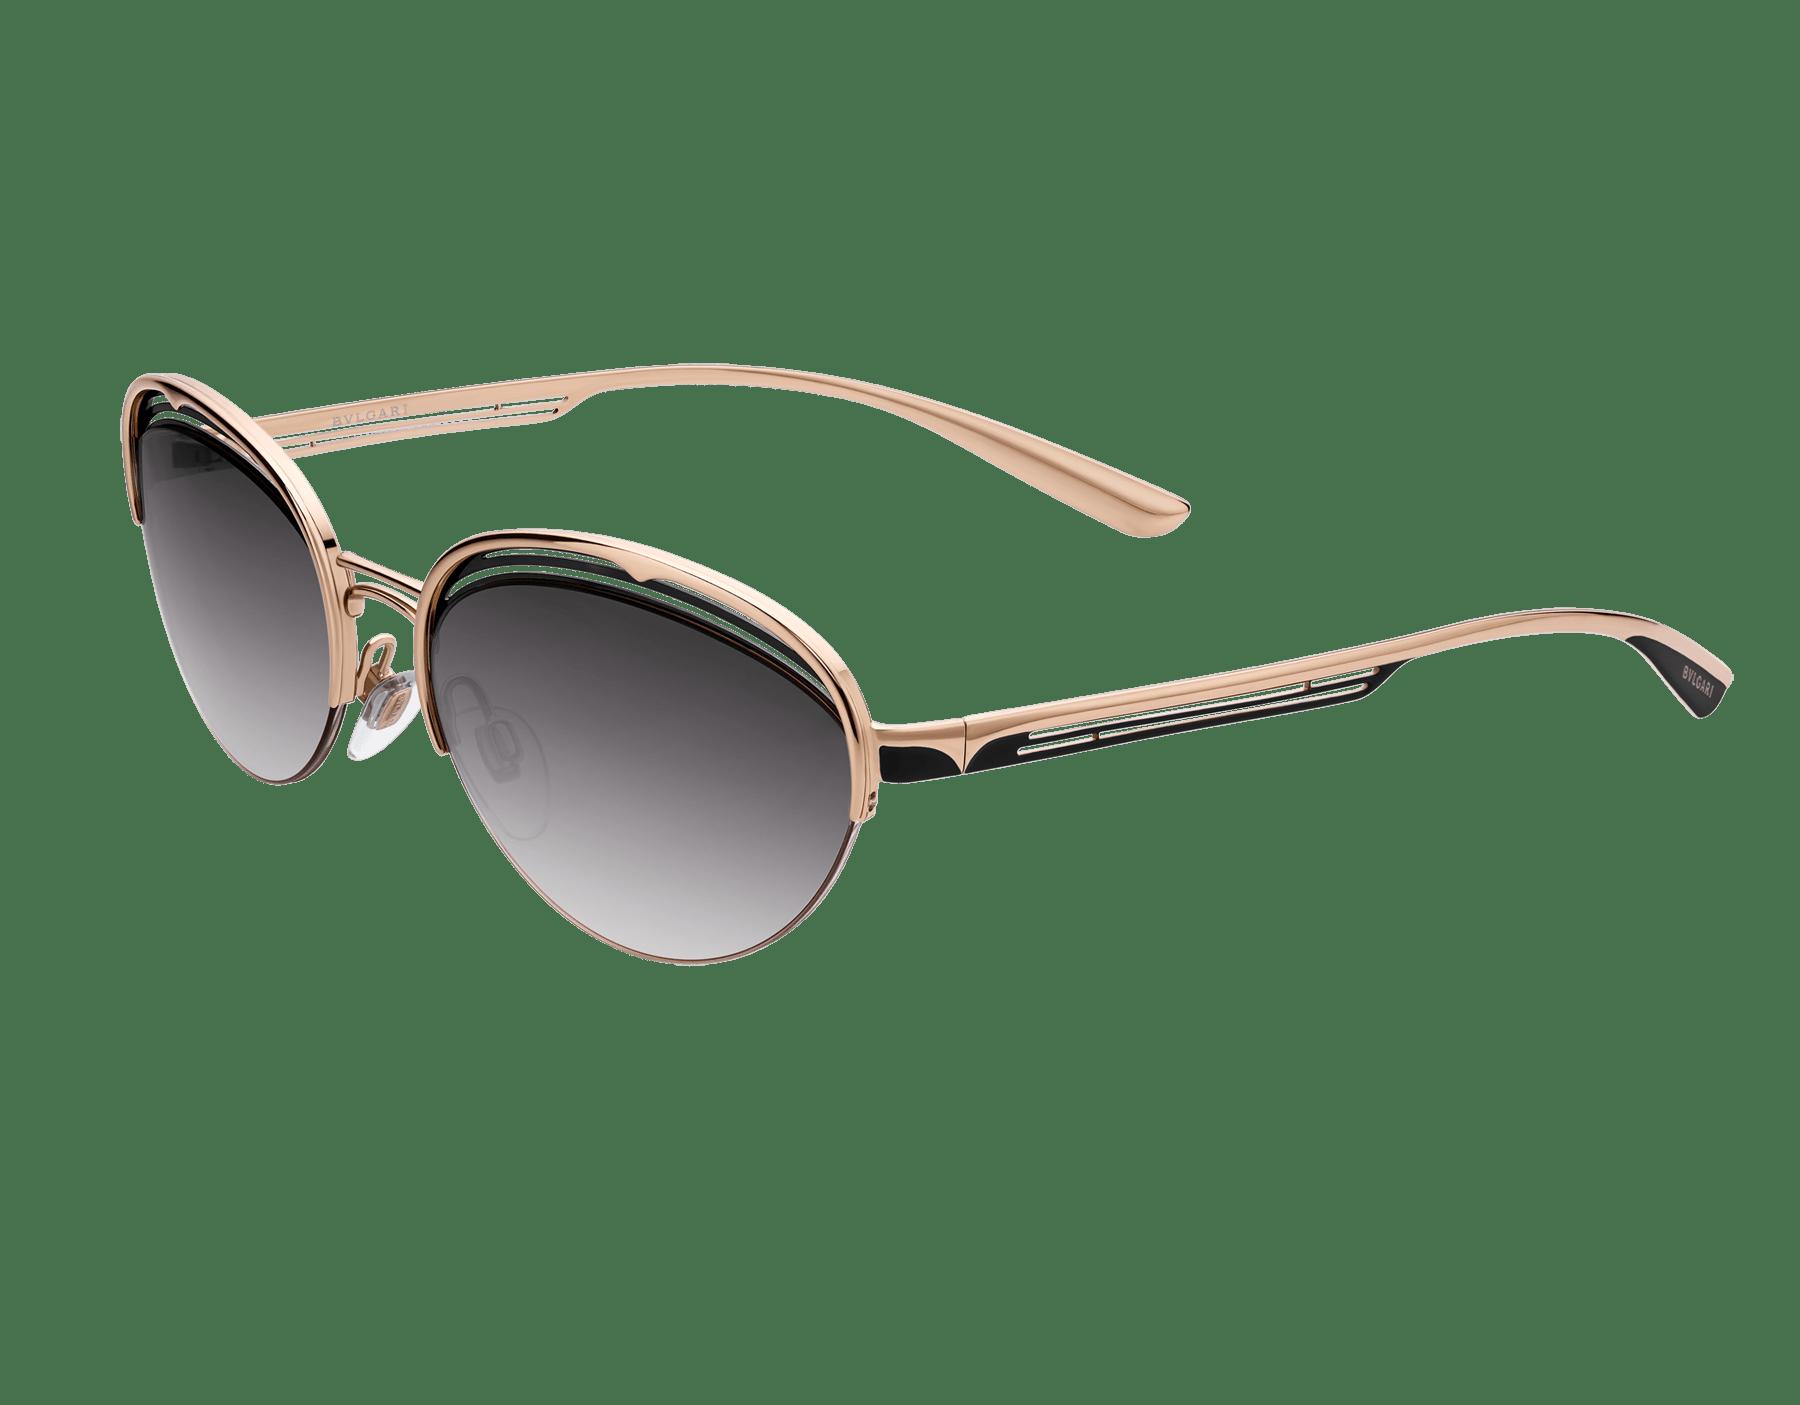 Bulgari B.zero1 B.retrovibe half rim oval metal sunglasses. 903893 image 1